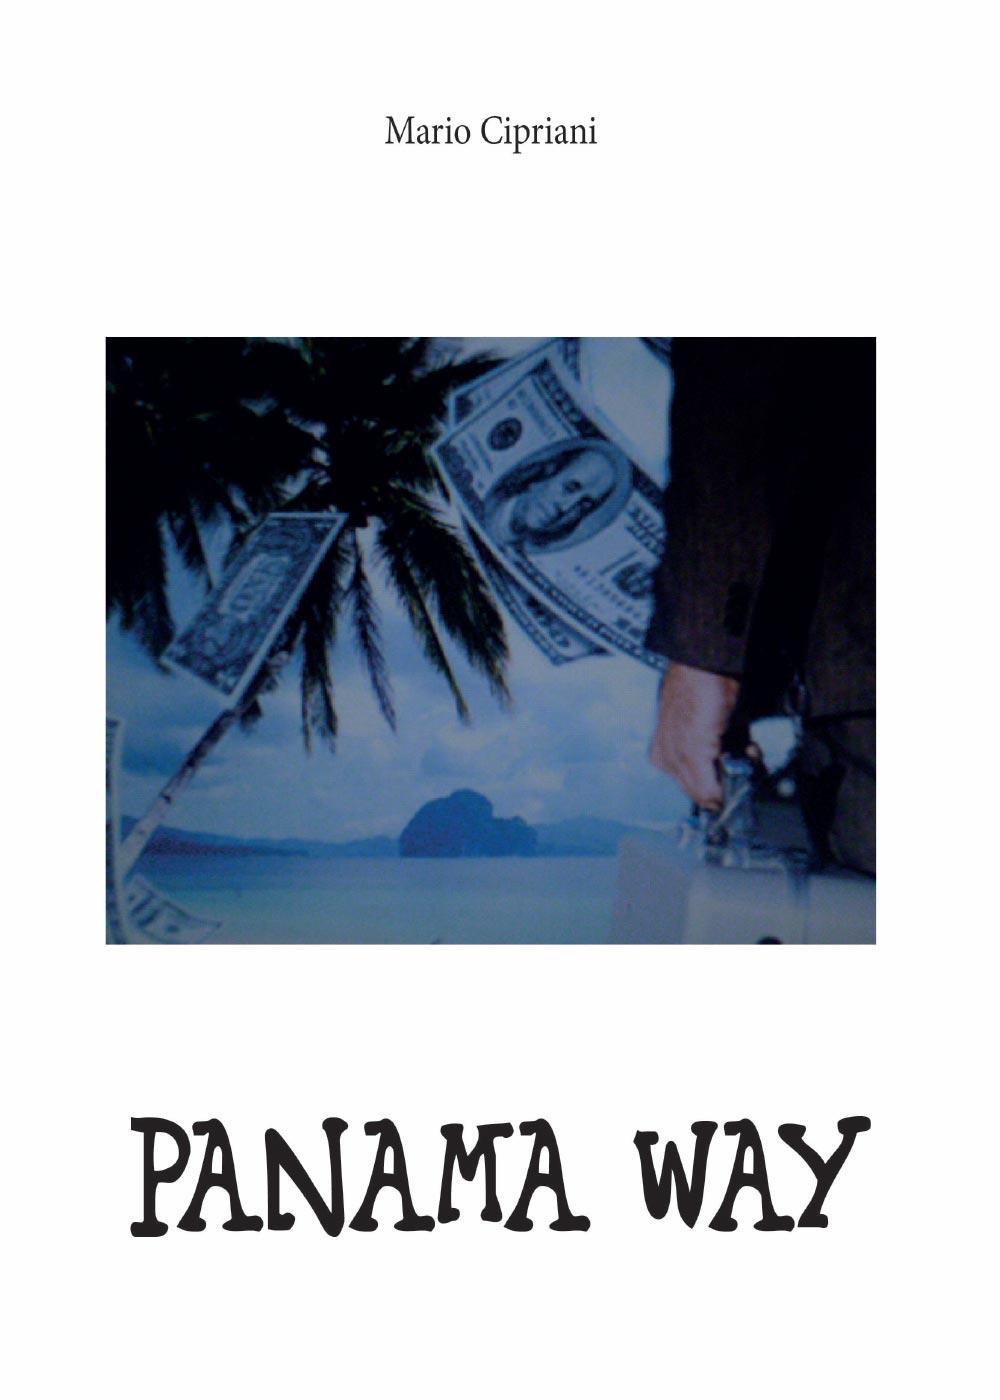 Panama way